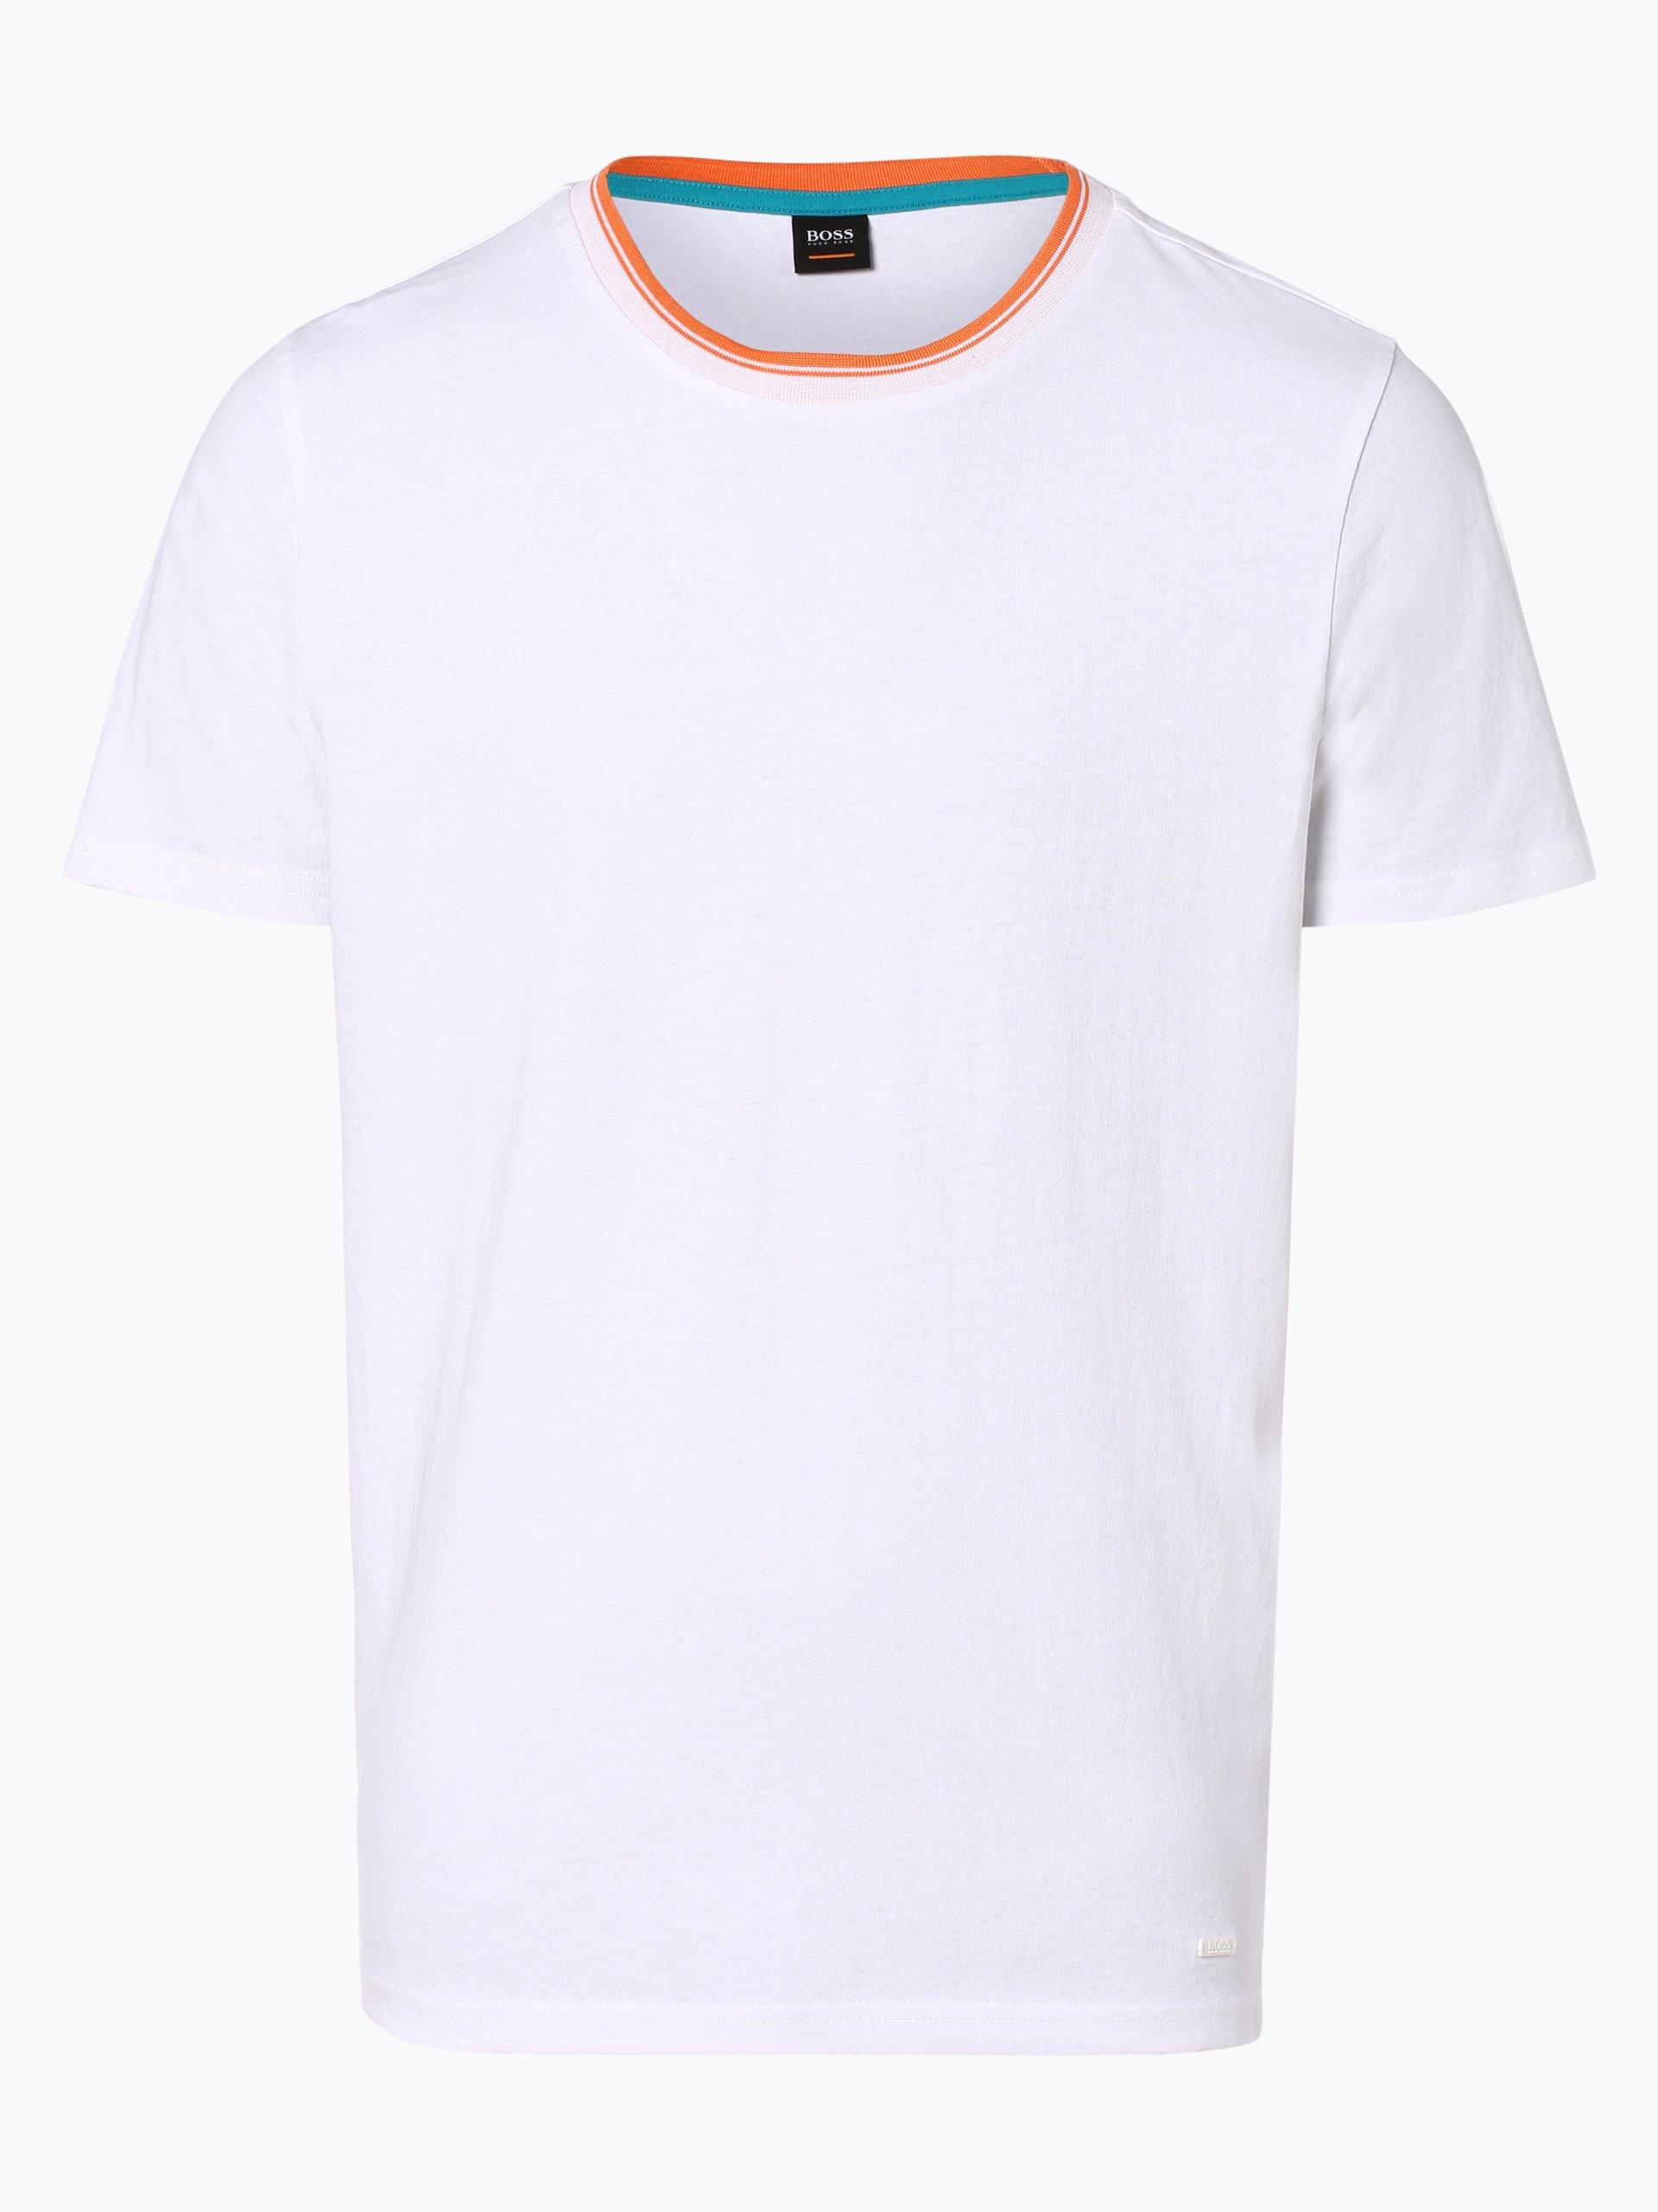 BOSS Casual T-shirt męski – Taugur